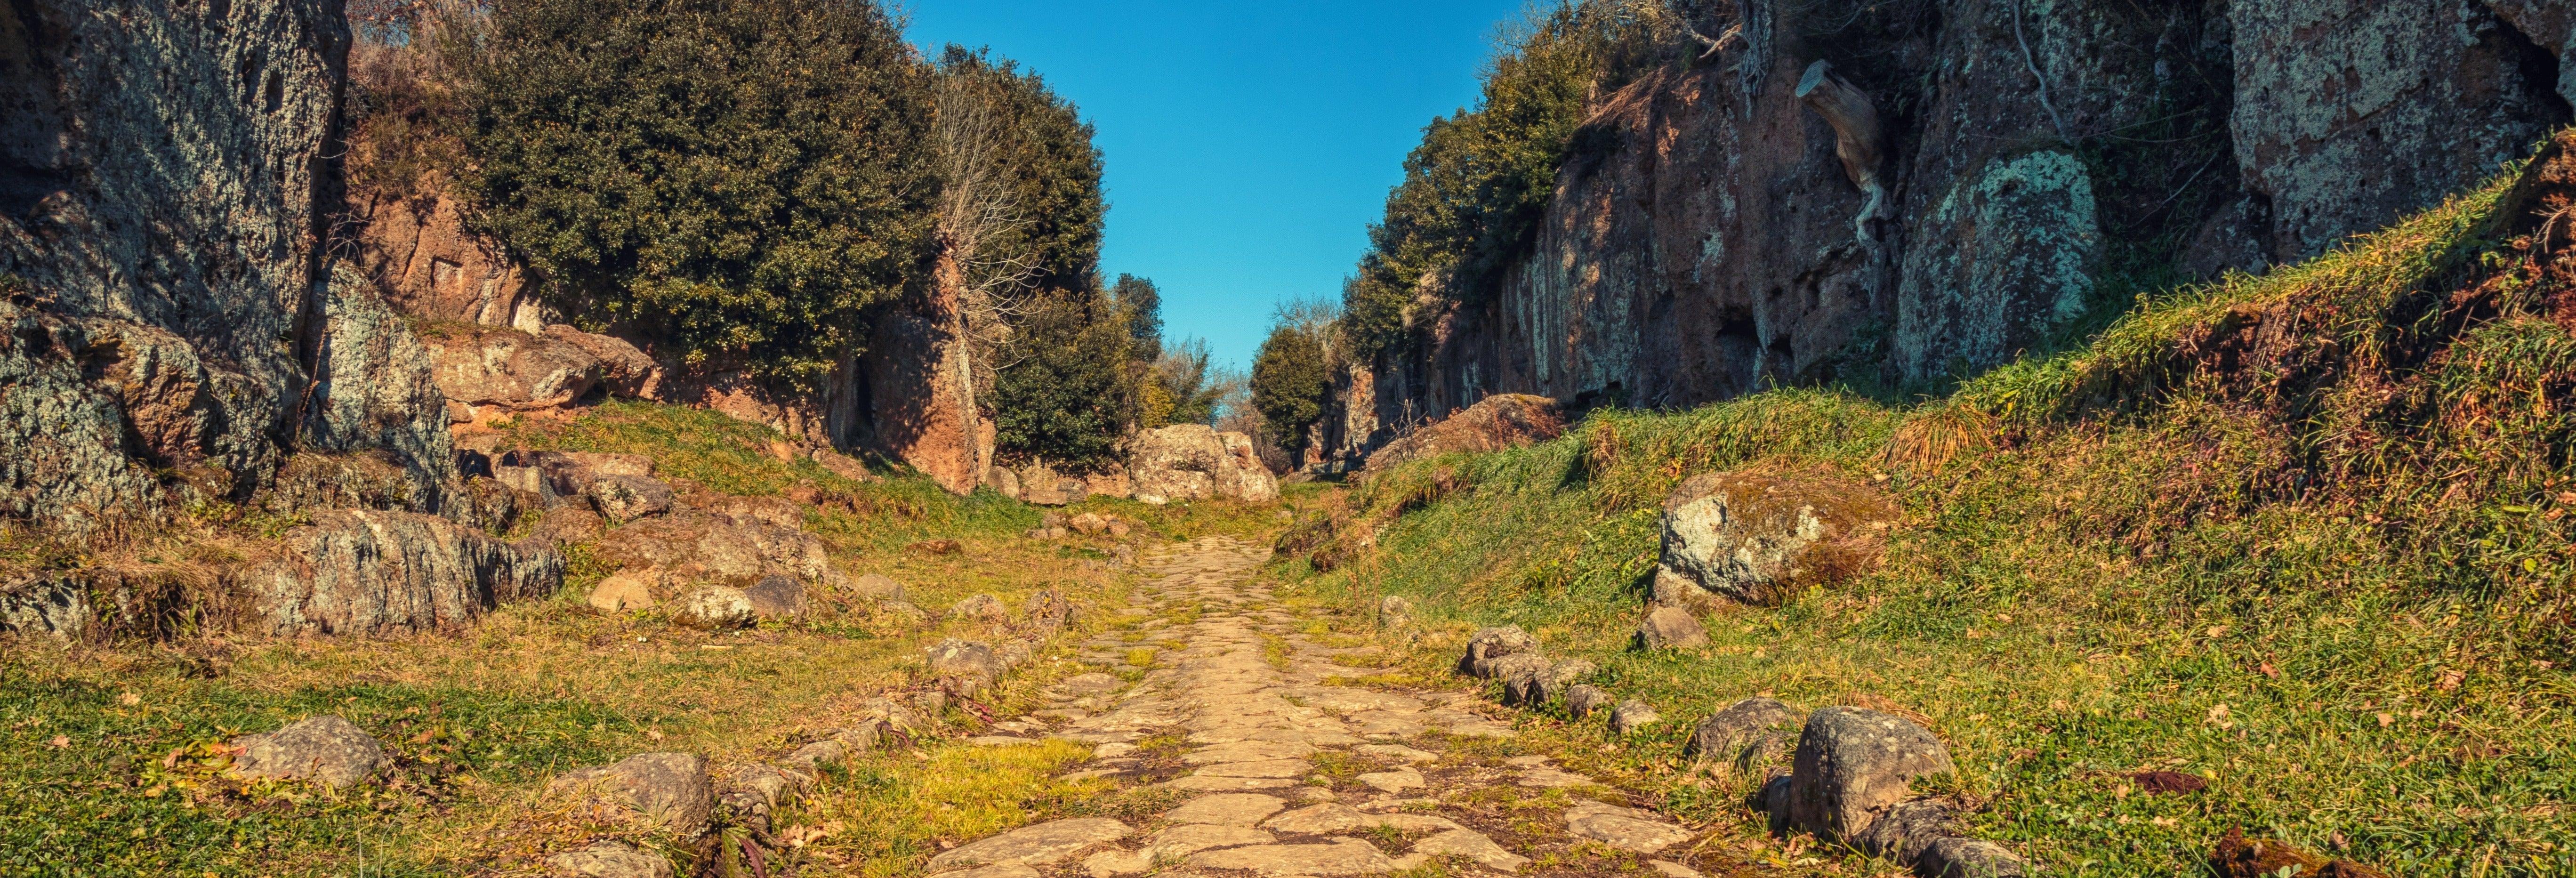 Via Amerina and Civita Castellana Trip